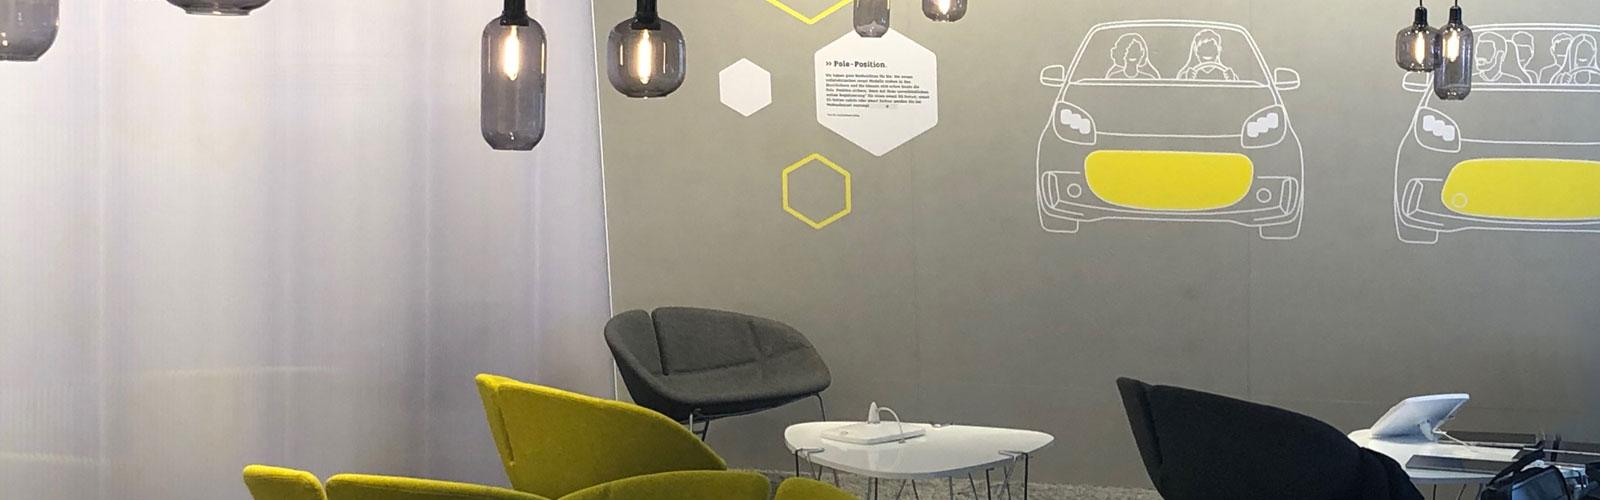 Braunwagner Spatial Interior Communication Design smart IAA Frankfurt 2019